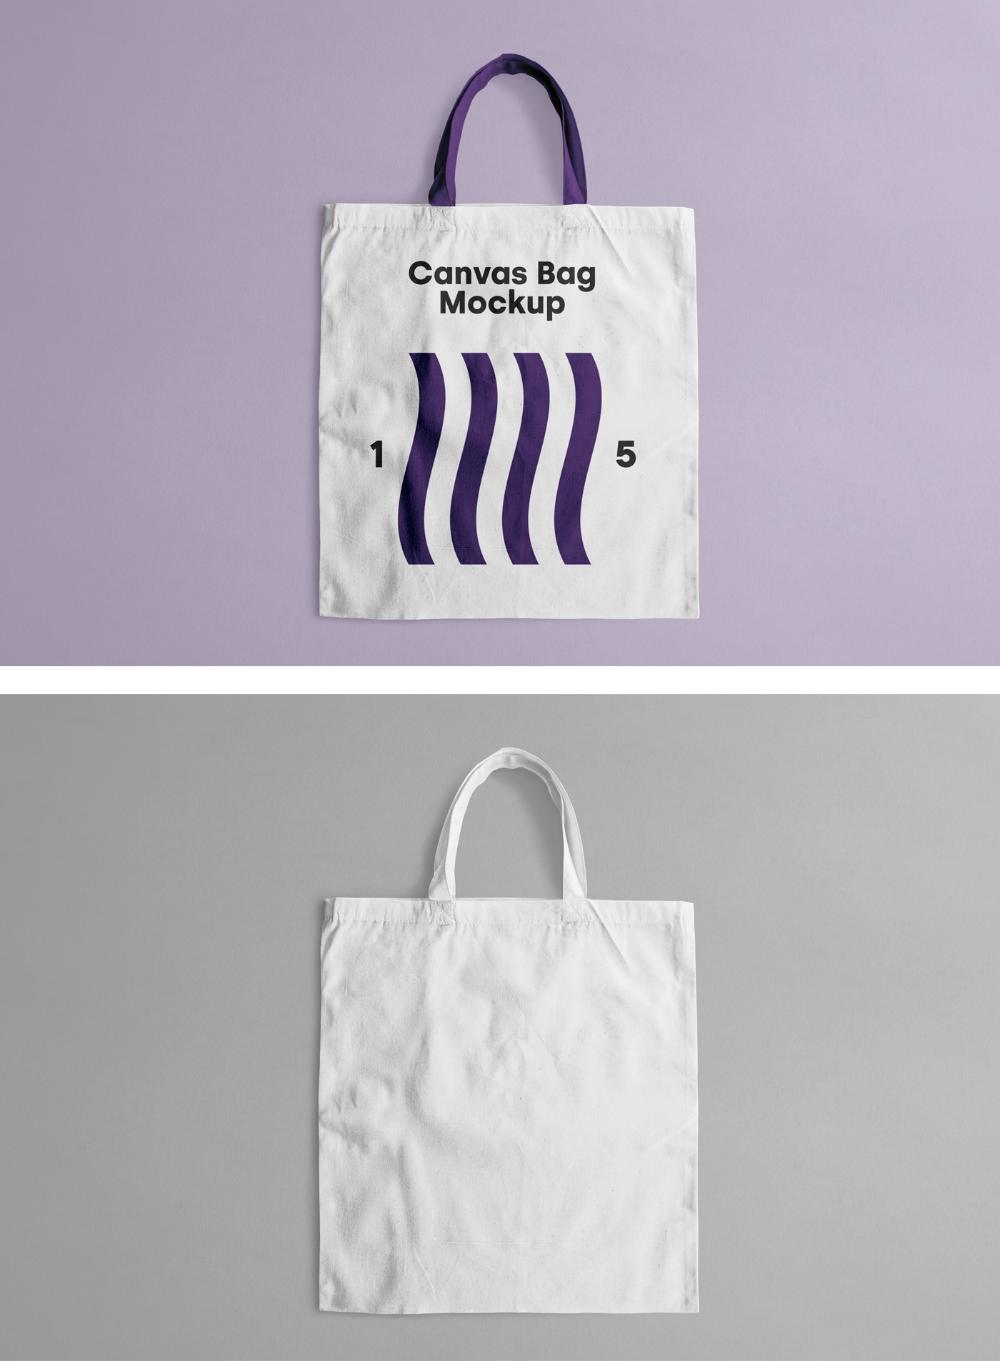 Download Canvas Tote Bag Mockup Mr Mockup Graphic Design Freebies Bag Mockup Tote Bag Canvas Tote